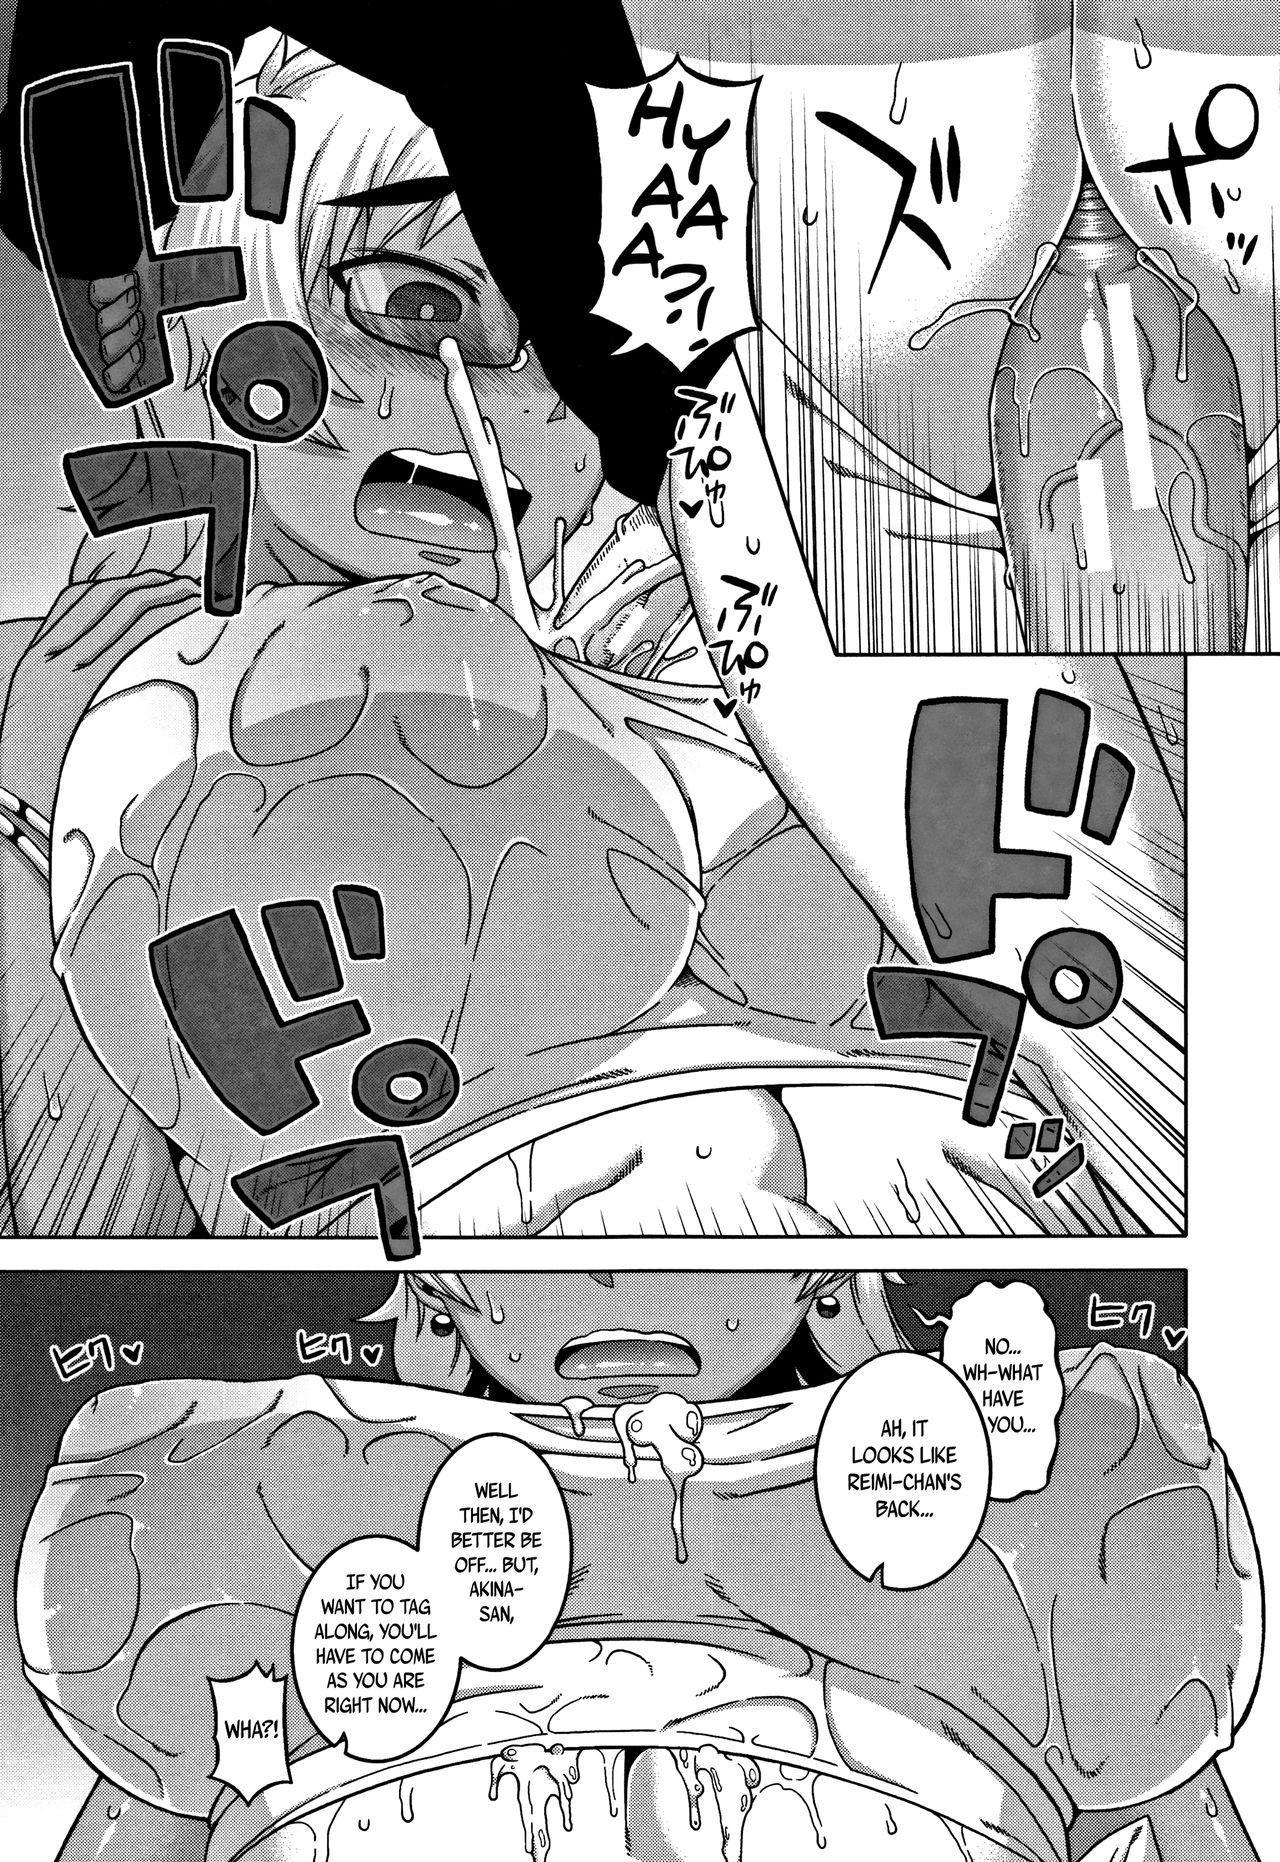 [Takatsu] Hitozuma A-san to Musuko no Yuujin N-kun - Married wife A and son's friend N-kun Ch. 1-3 [English] 94